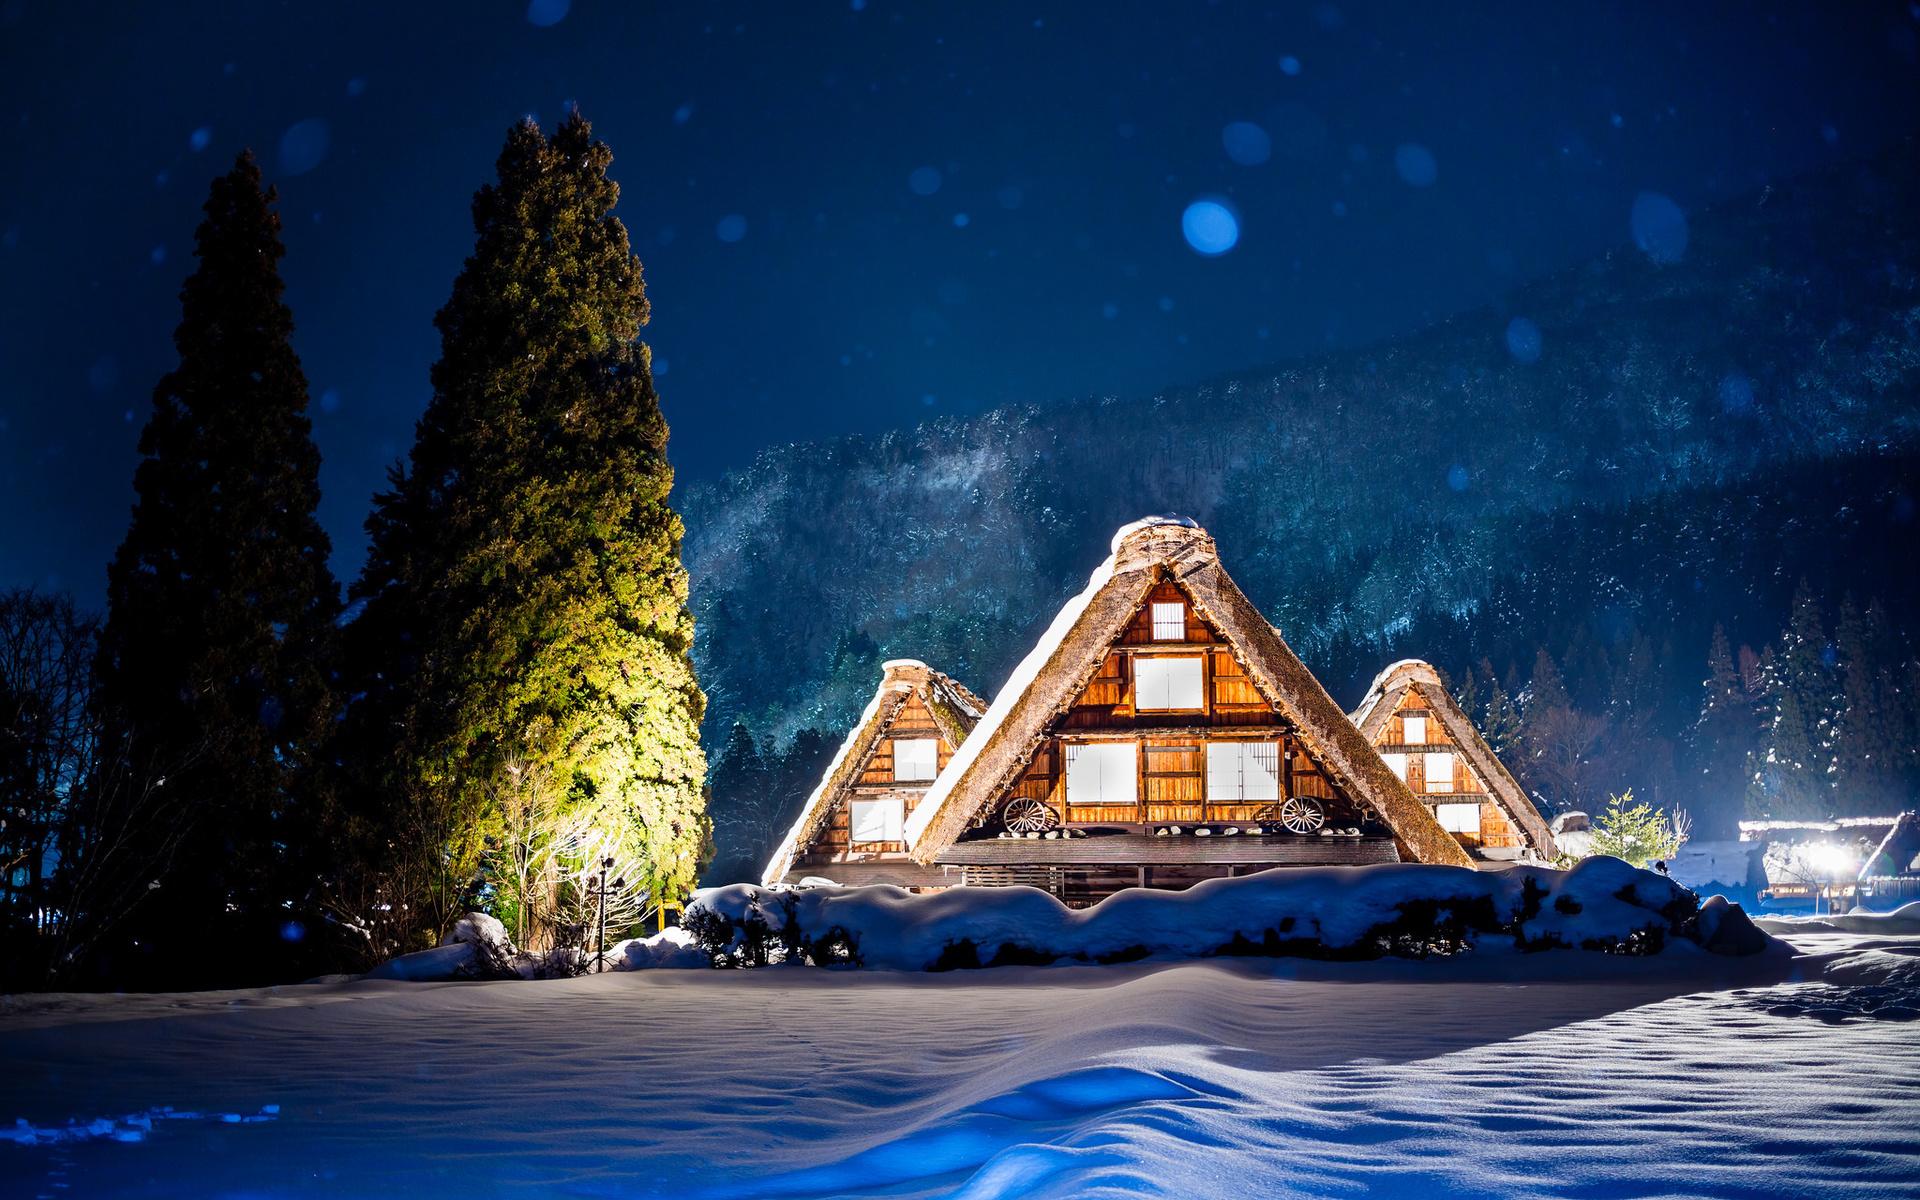 зимний дом фото картинки противном случае